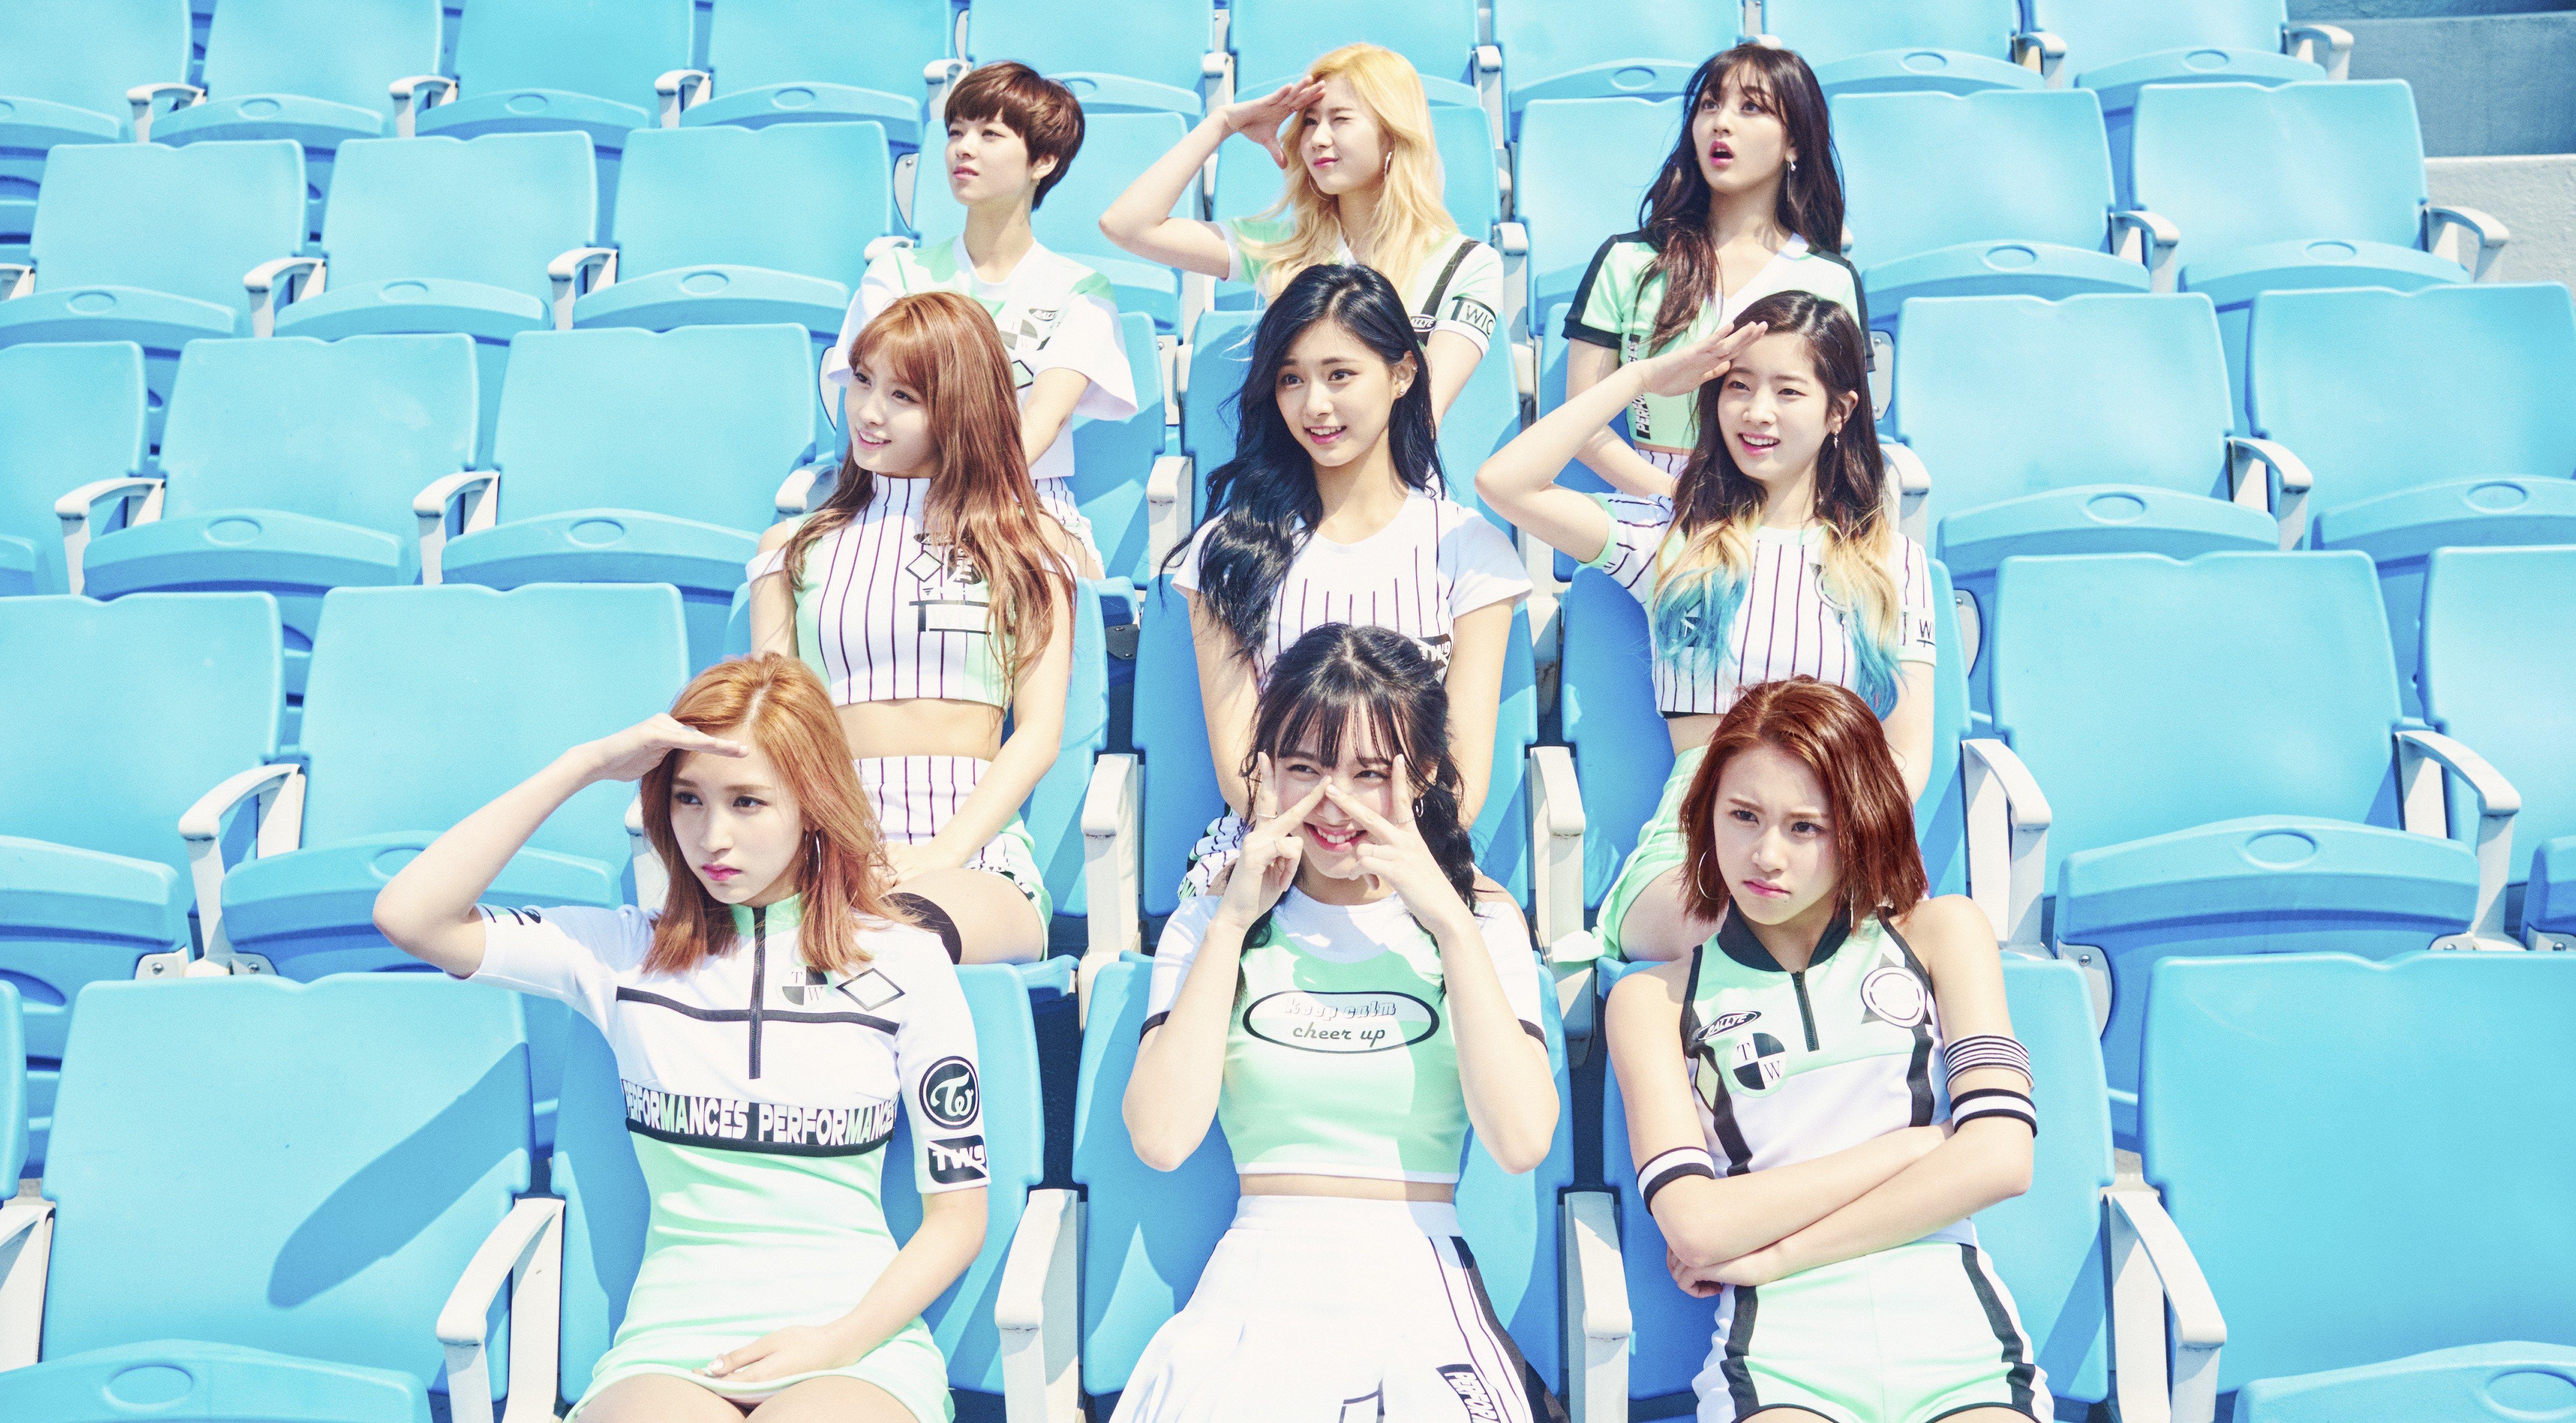 kpop stars 2016-ban astro-vision lifesign mini matchmaking